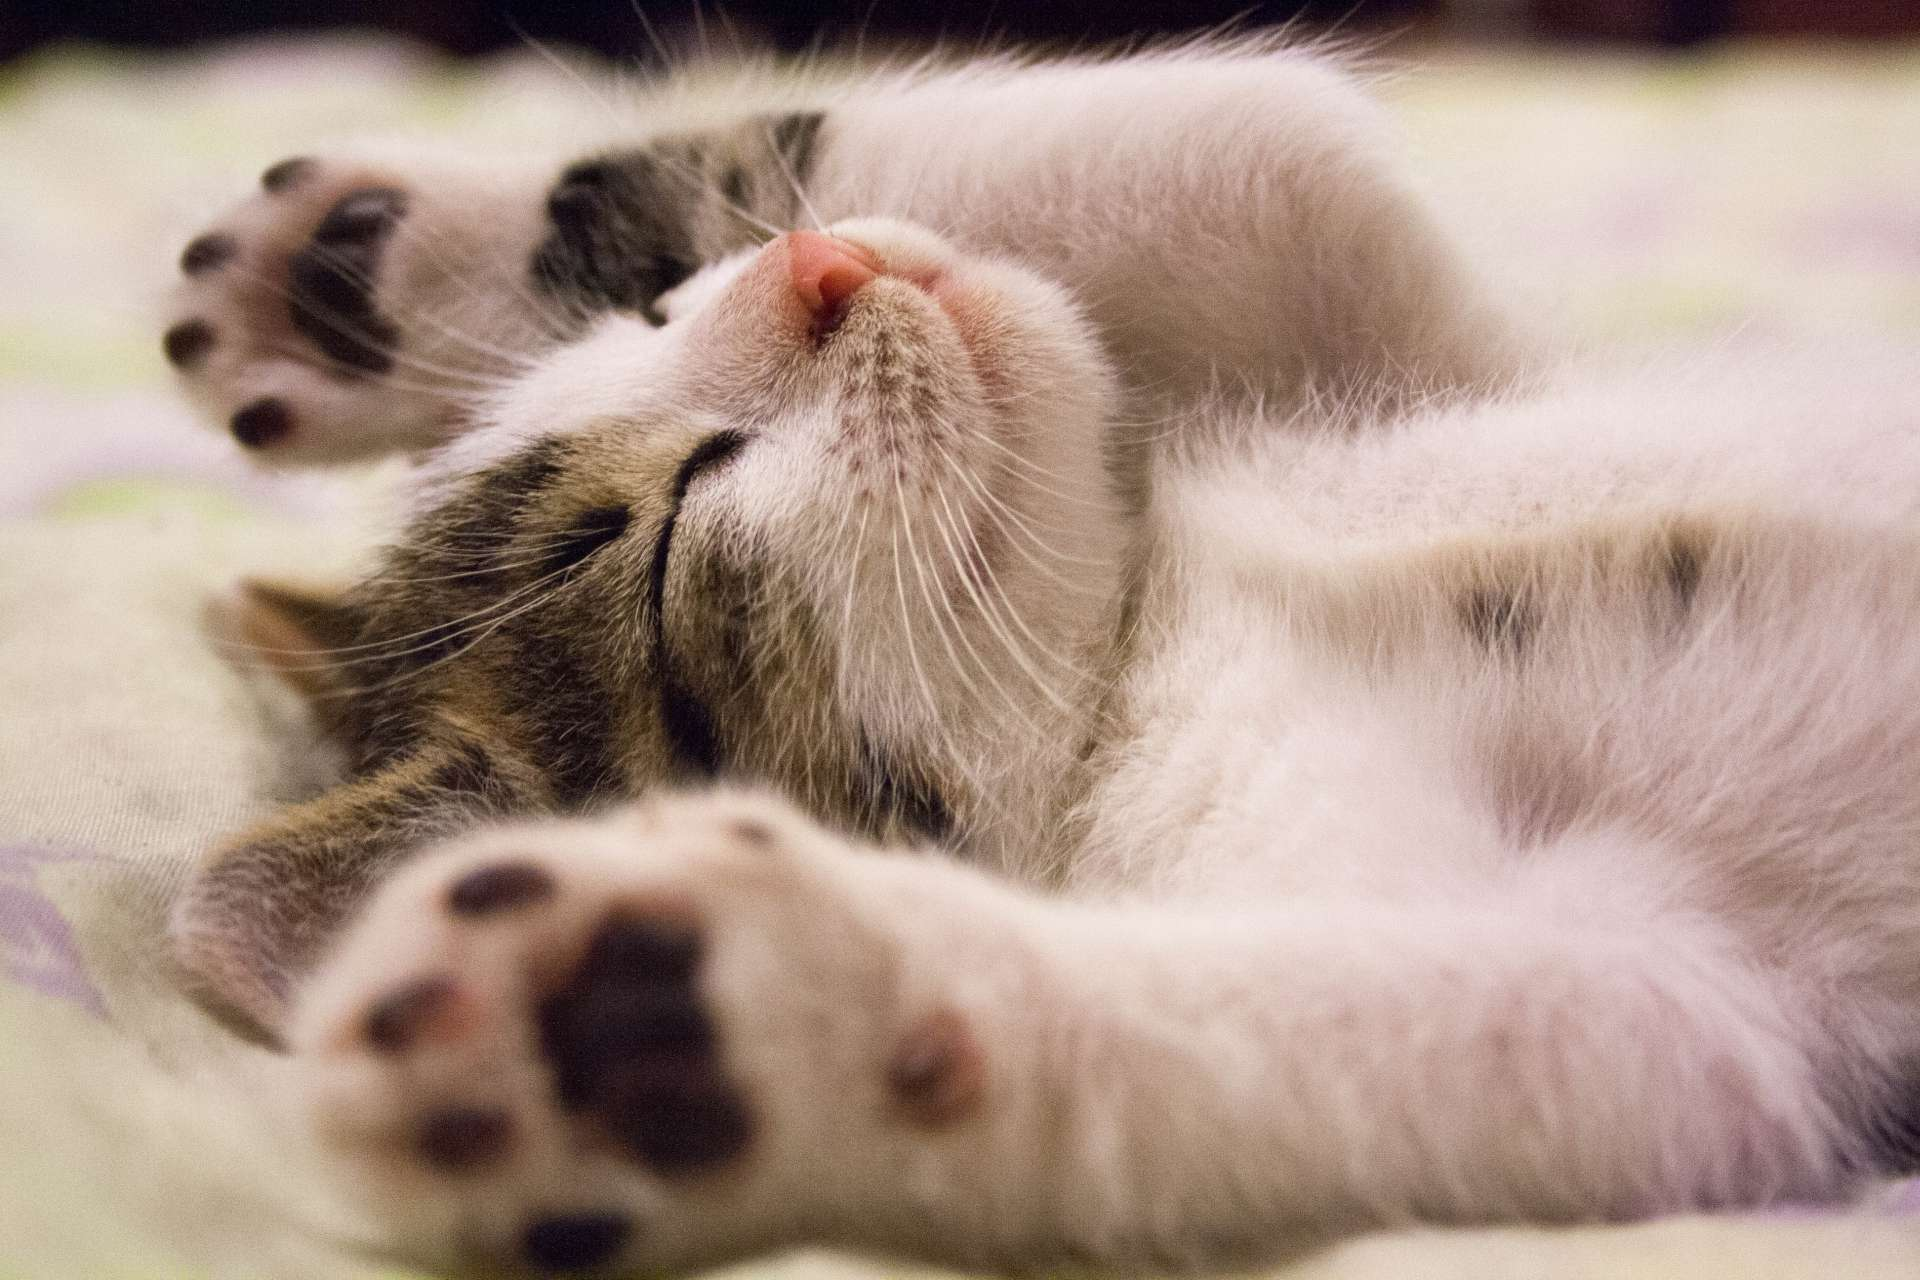 5c6997090886 Ασφάλιση Γάτας - Νο1 στις ειδικές ασφάλειες